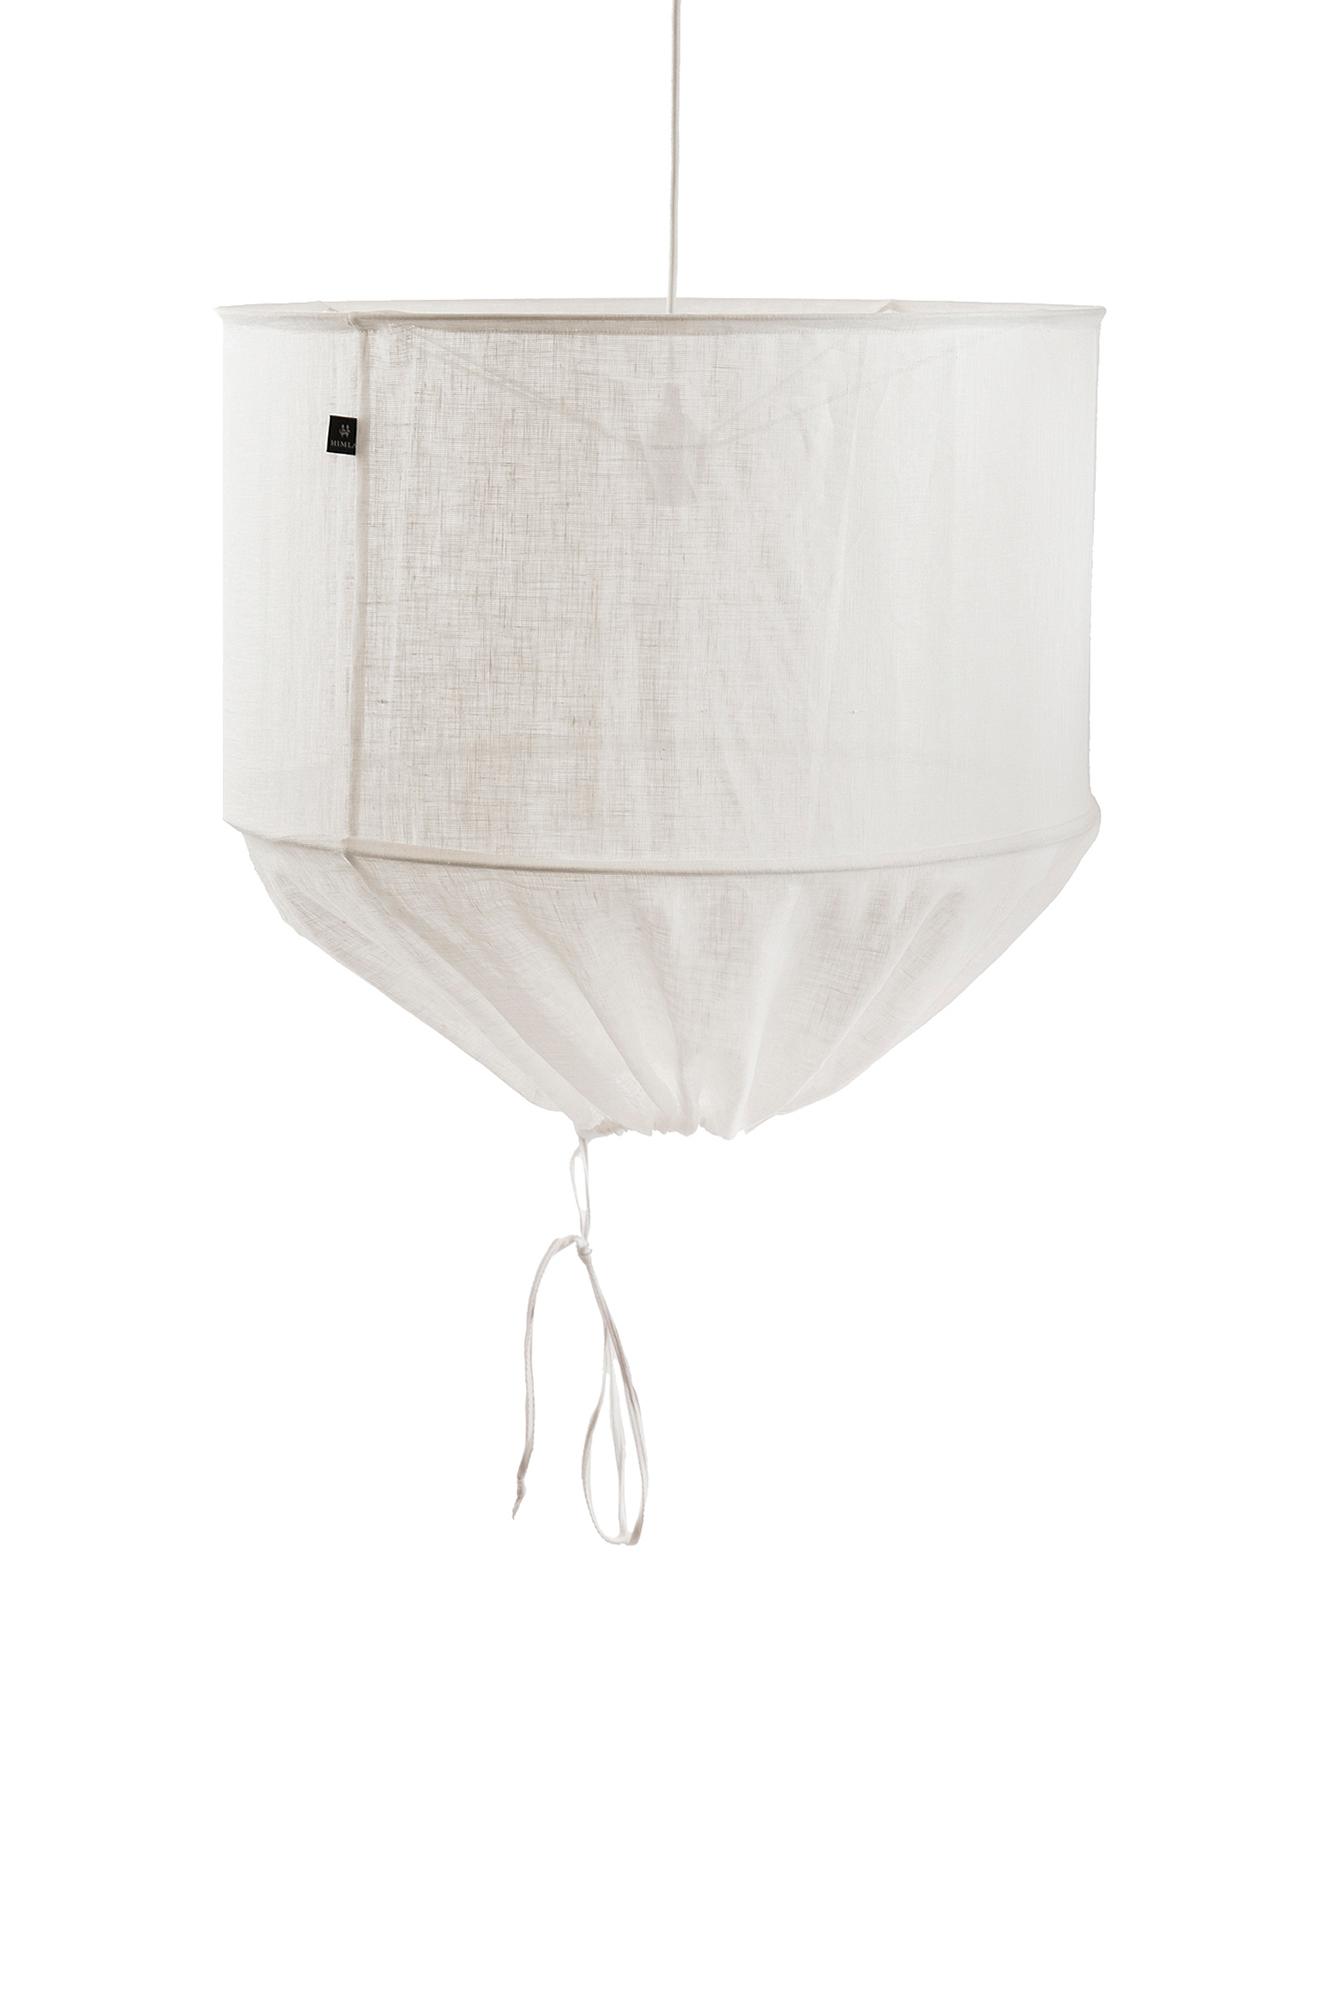 Dalsland-kattovalaisin, Ø 60 cm